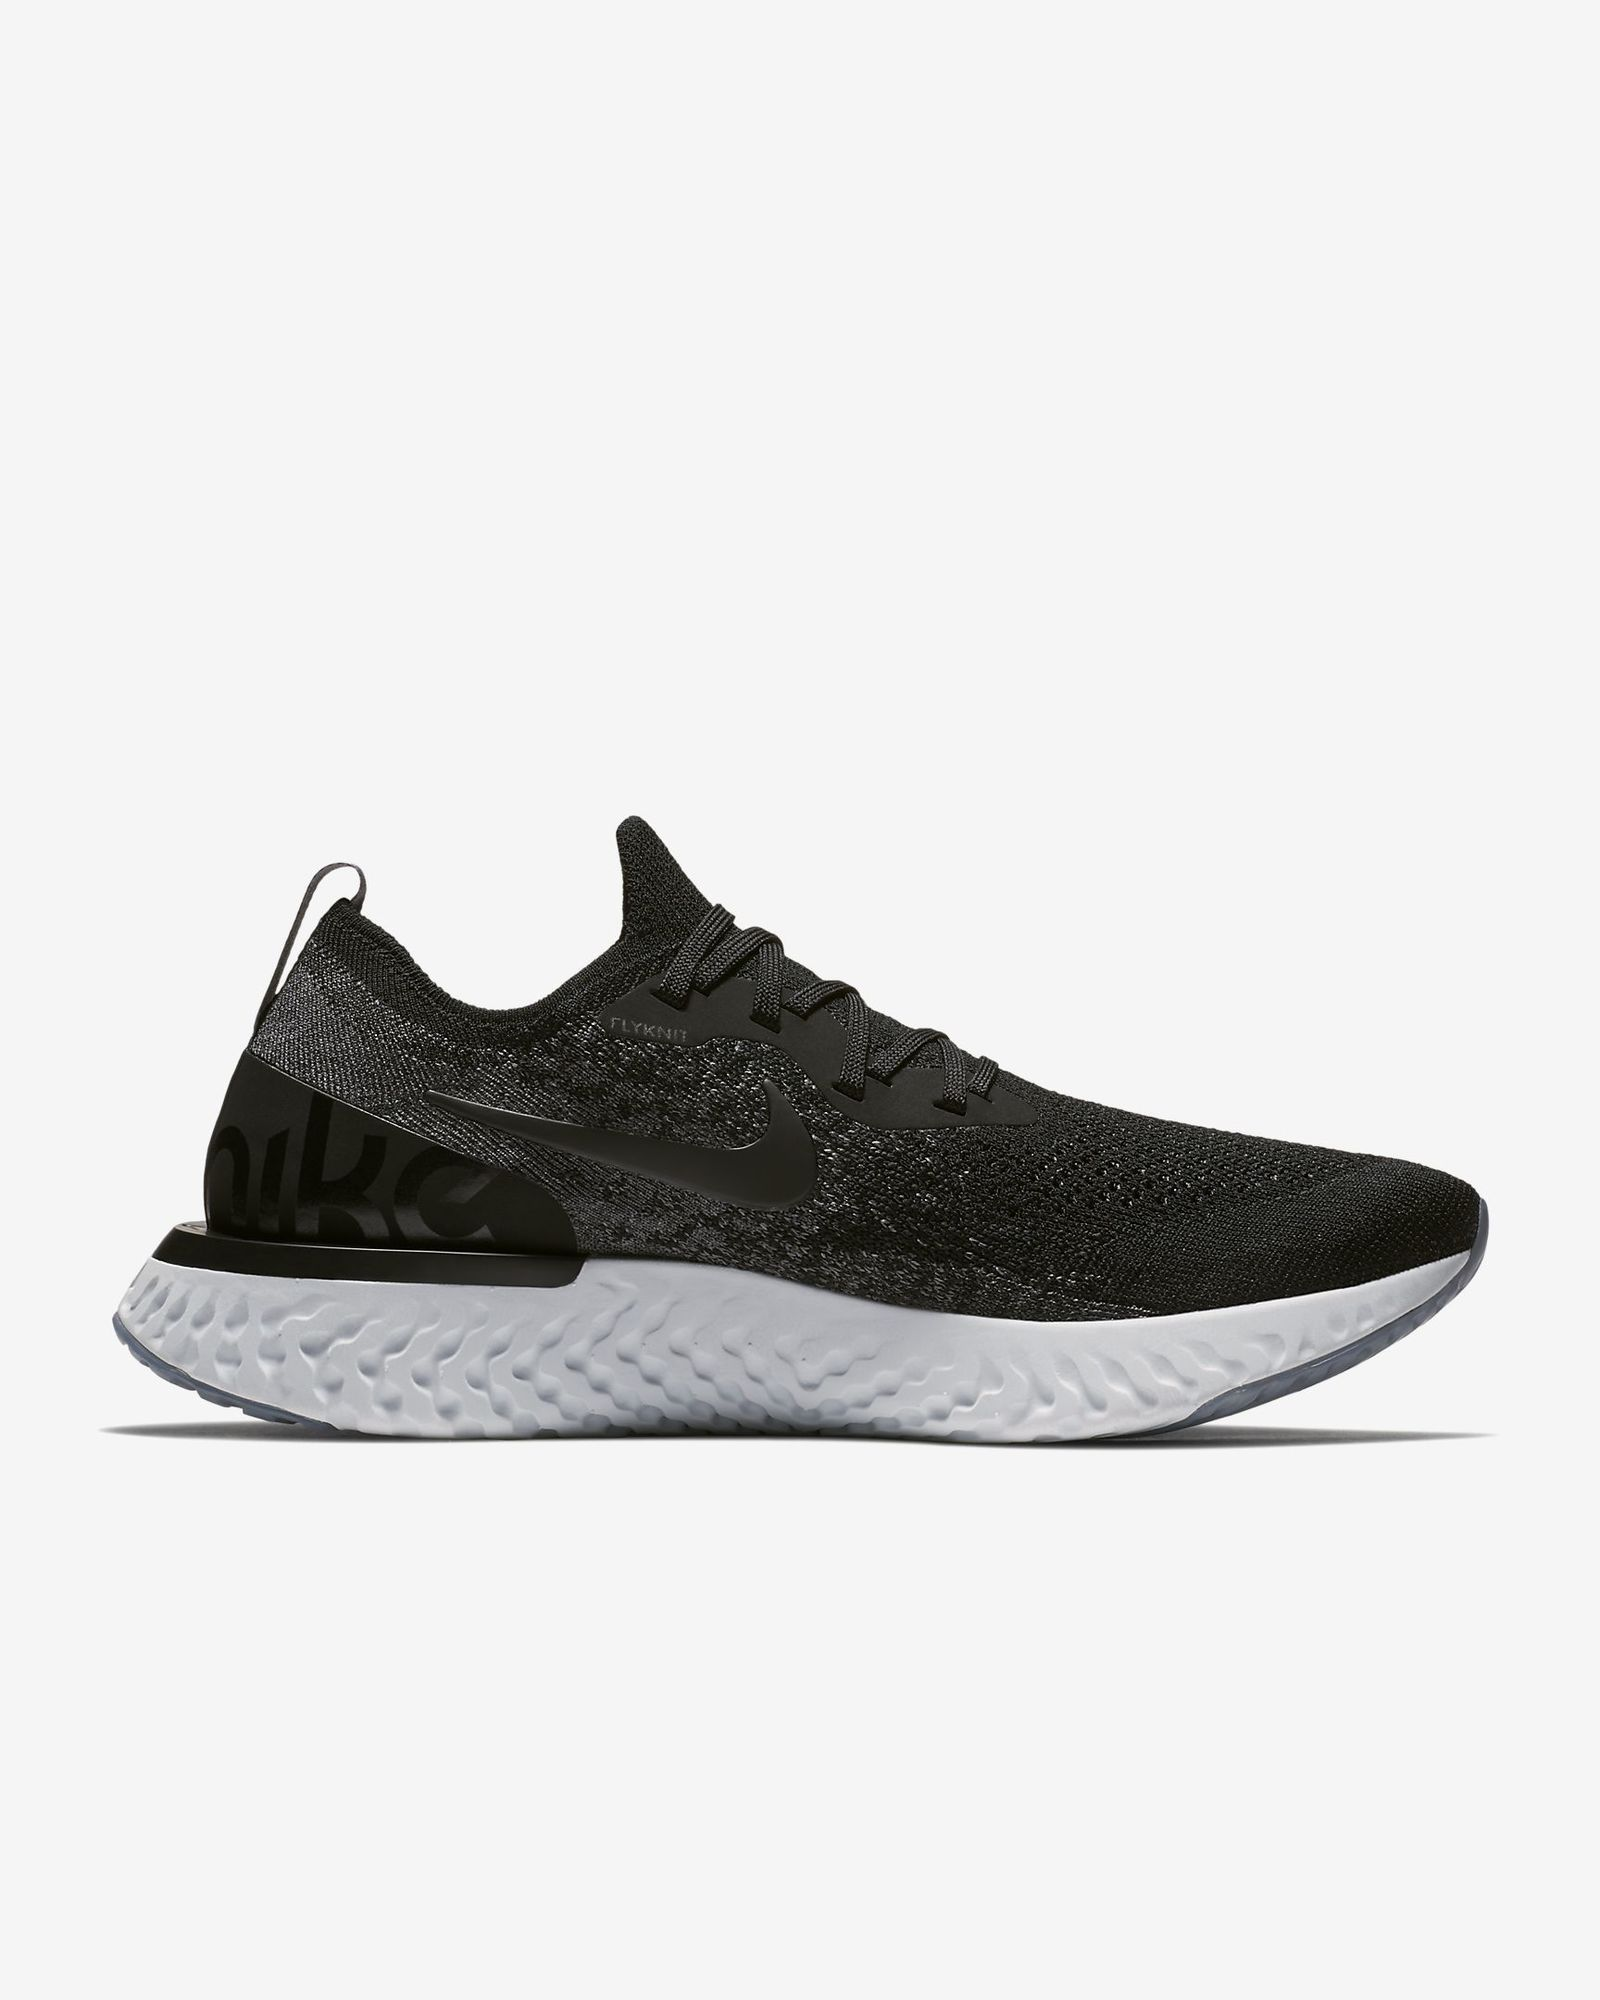 Nike Epic React Flyknit in Schwarz Grau Platin